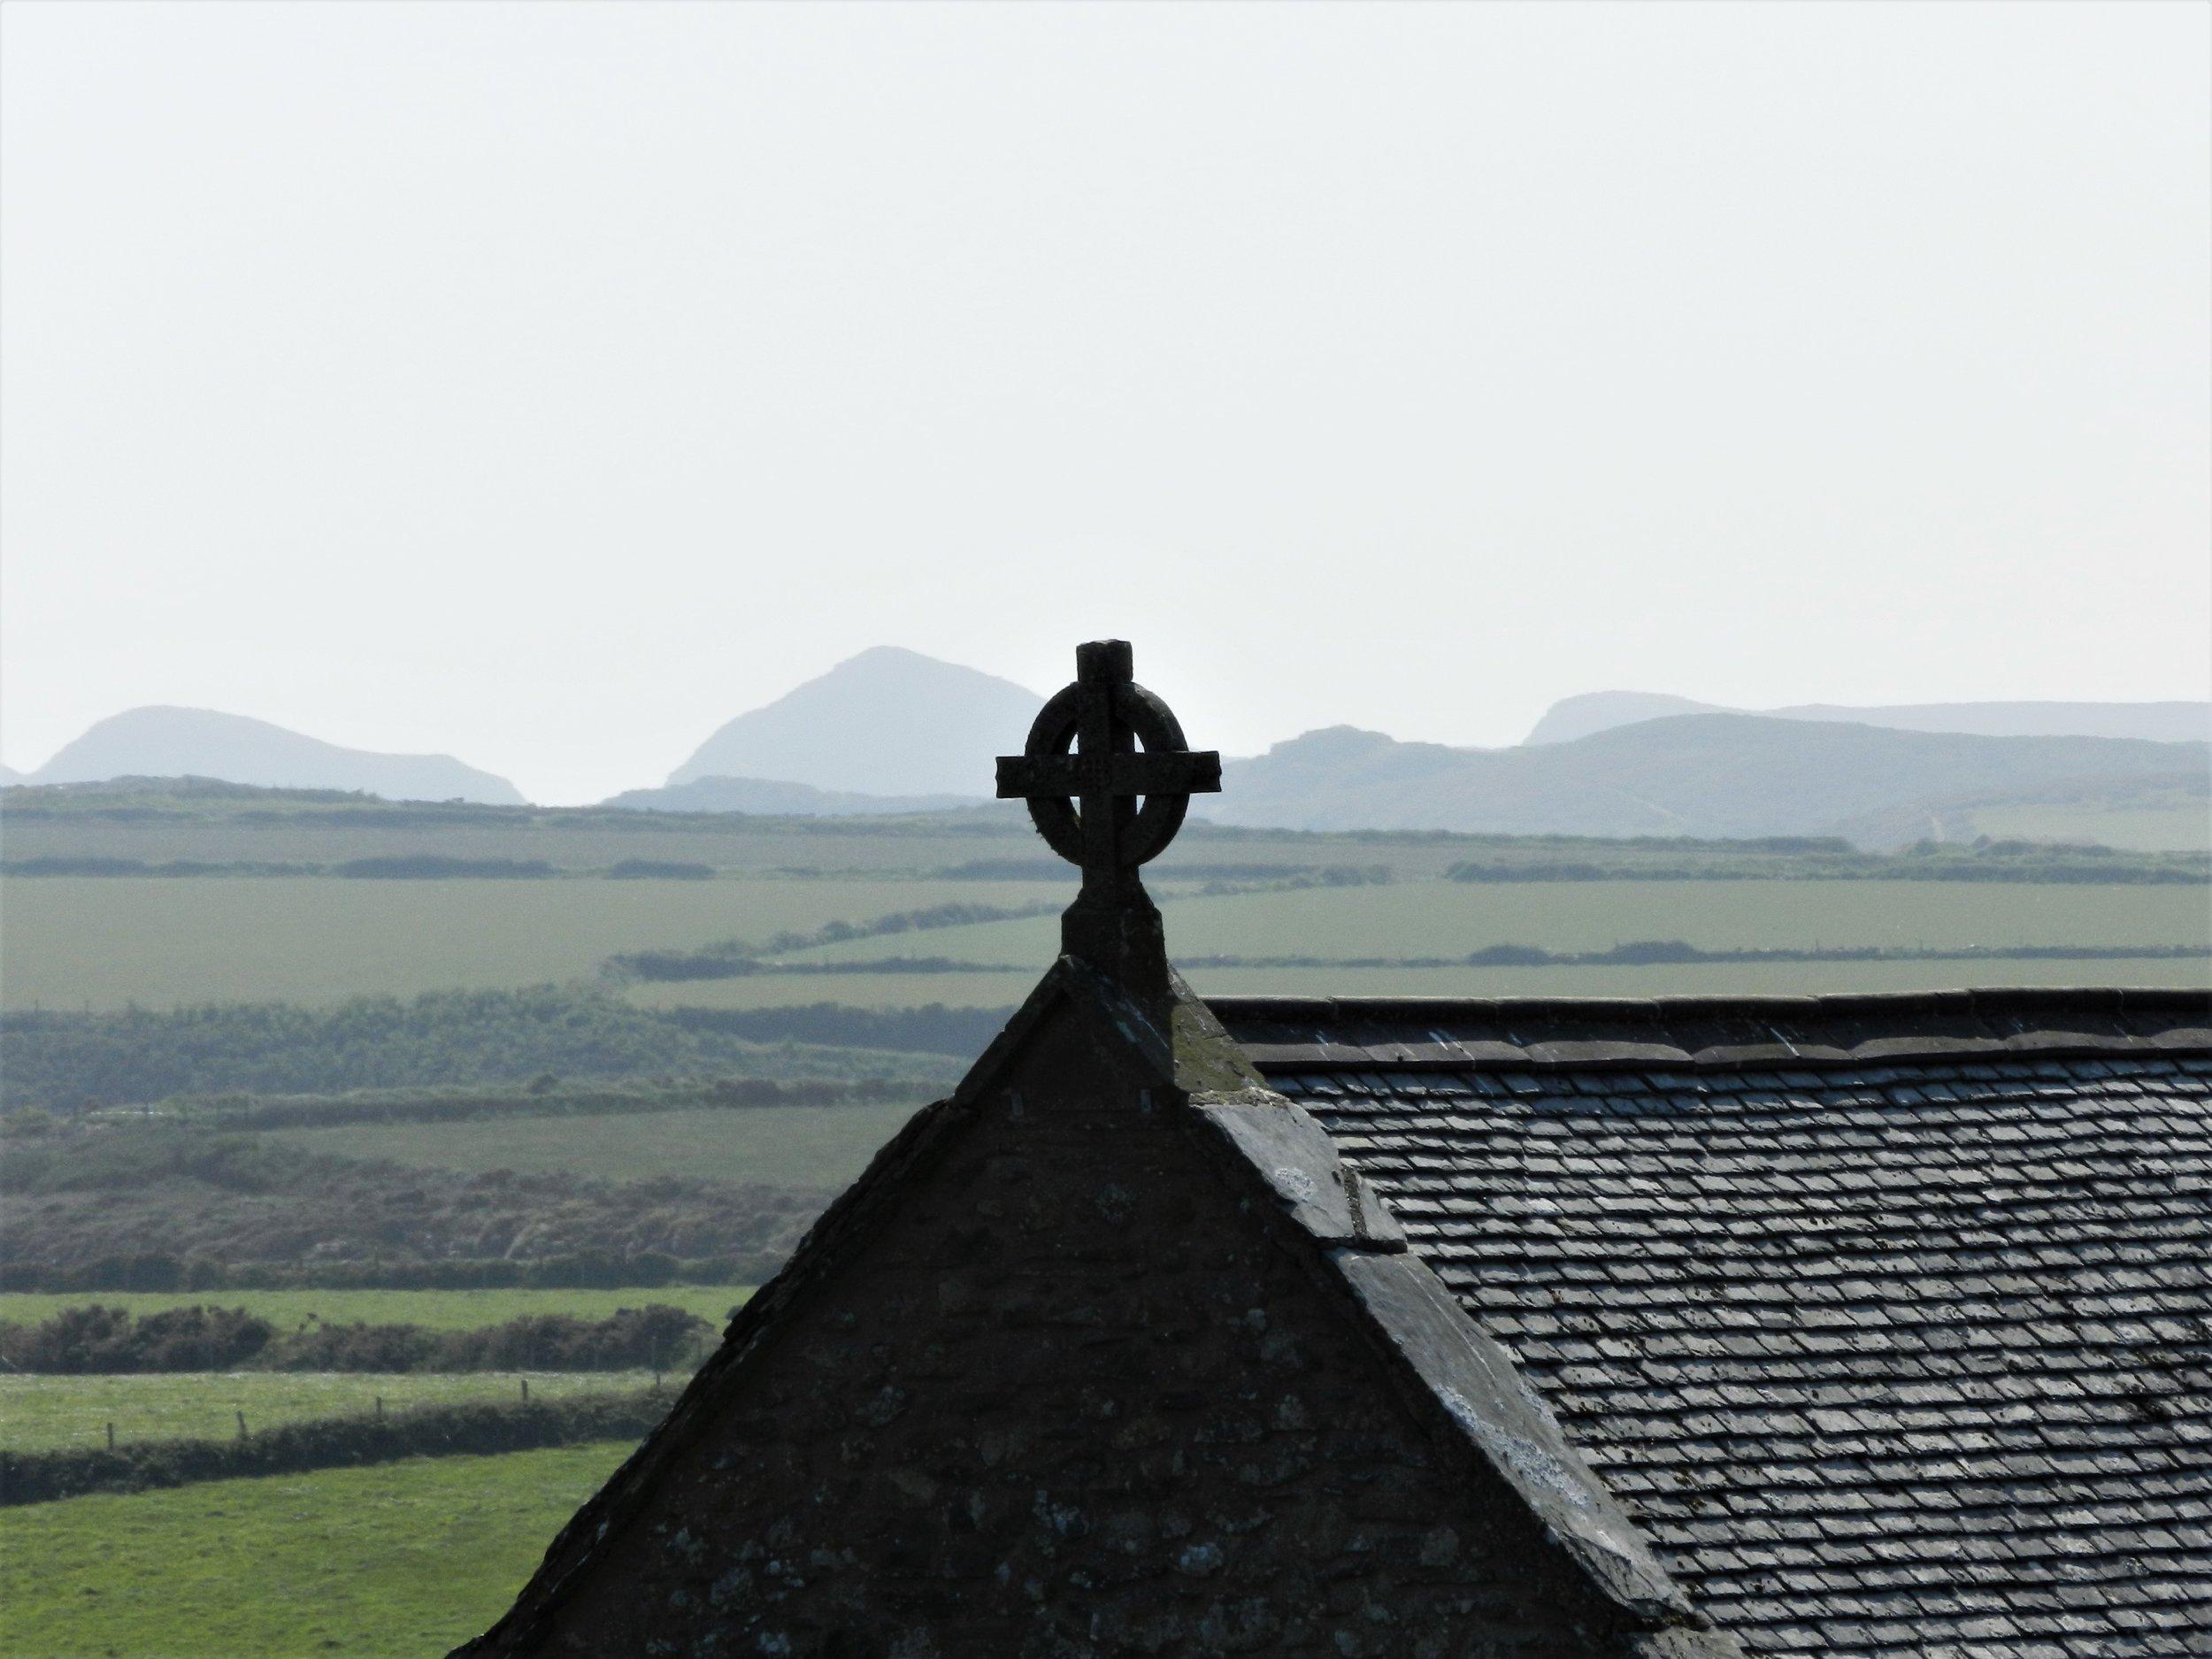 St. Non's Chapel, Wales